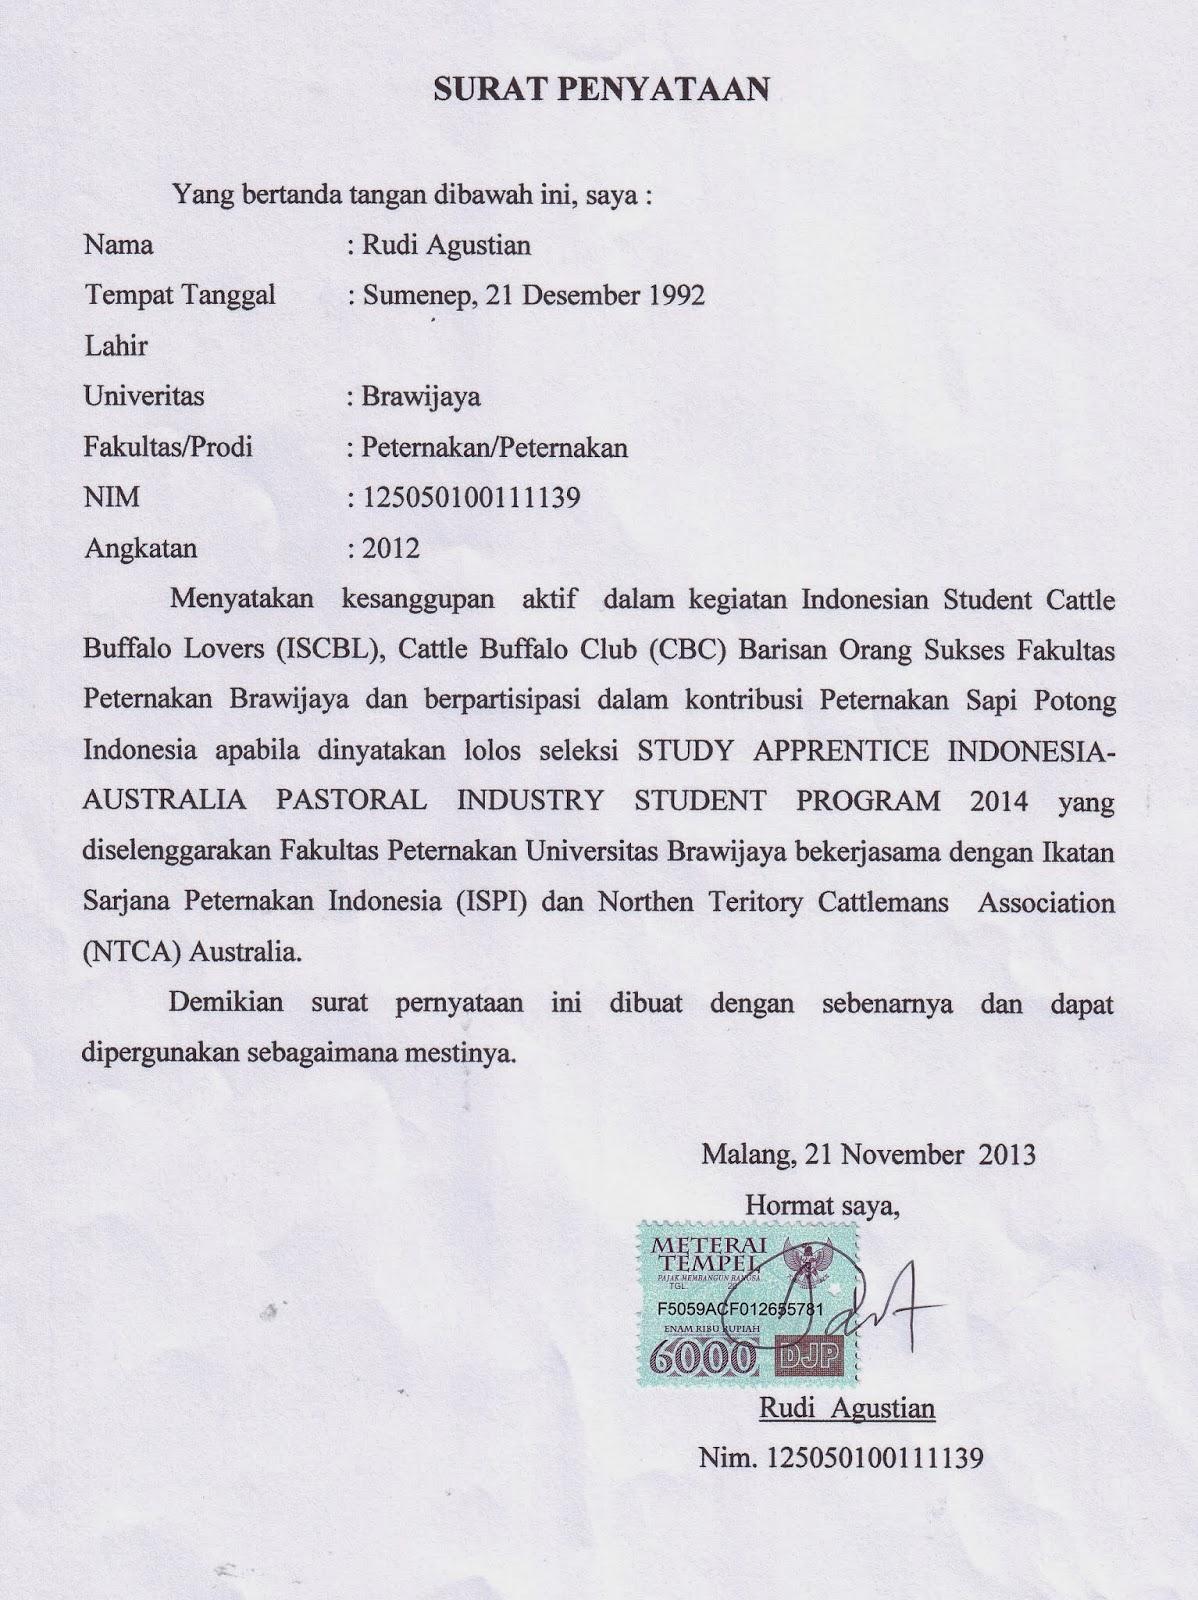 Contoh Surat Pernyataan Bergabung Dengan Organisasi Emperor Rudi